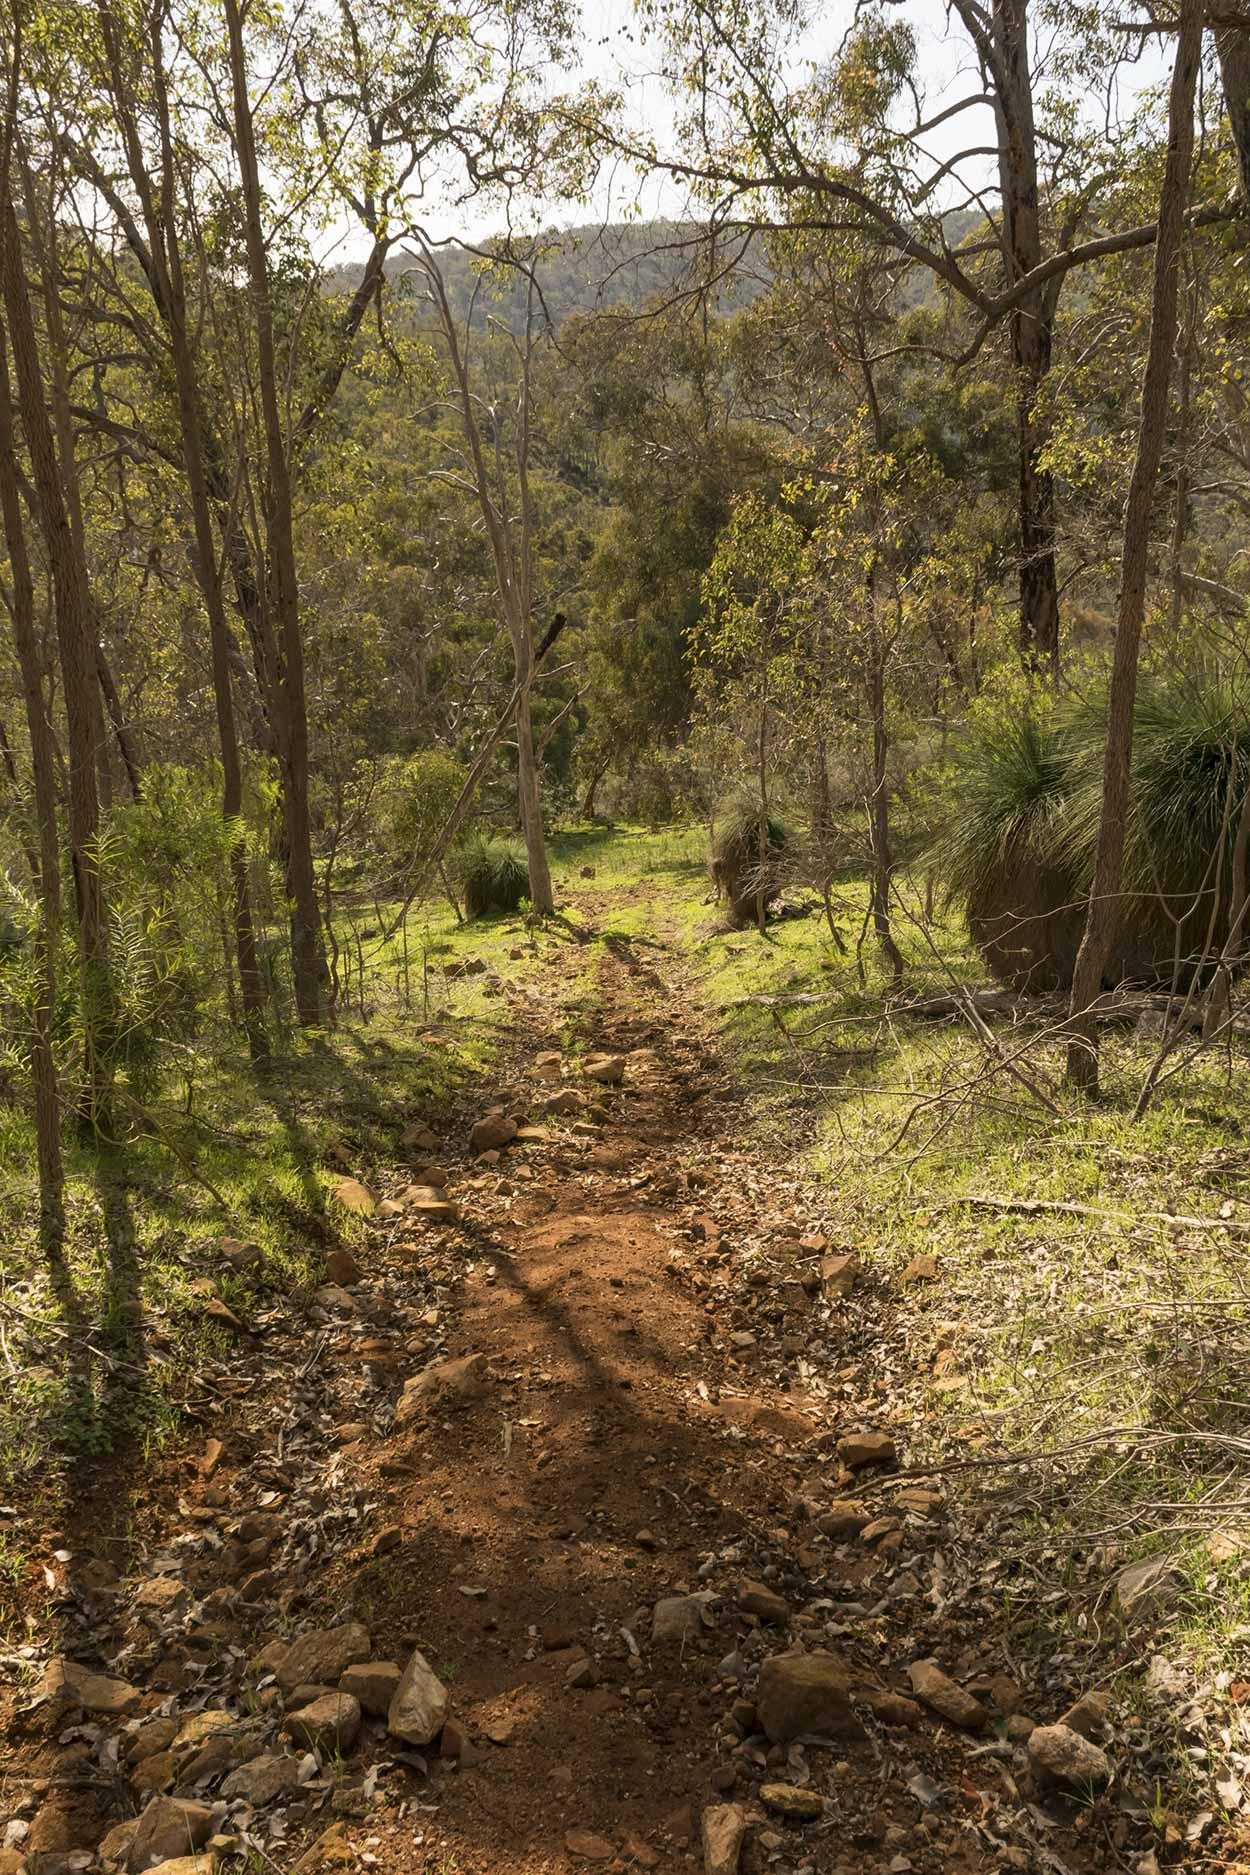 Steep path in Wungong Regional Park, Perth, Western Australia